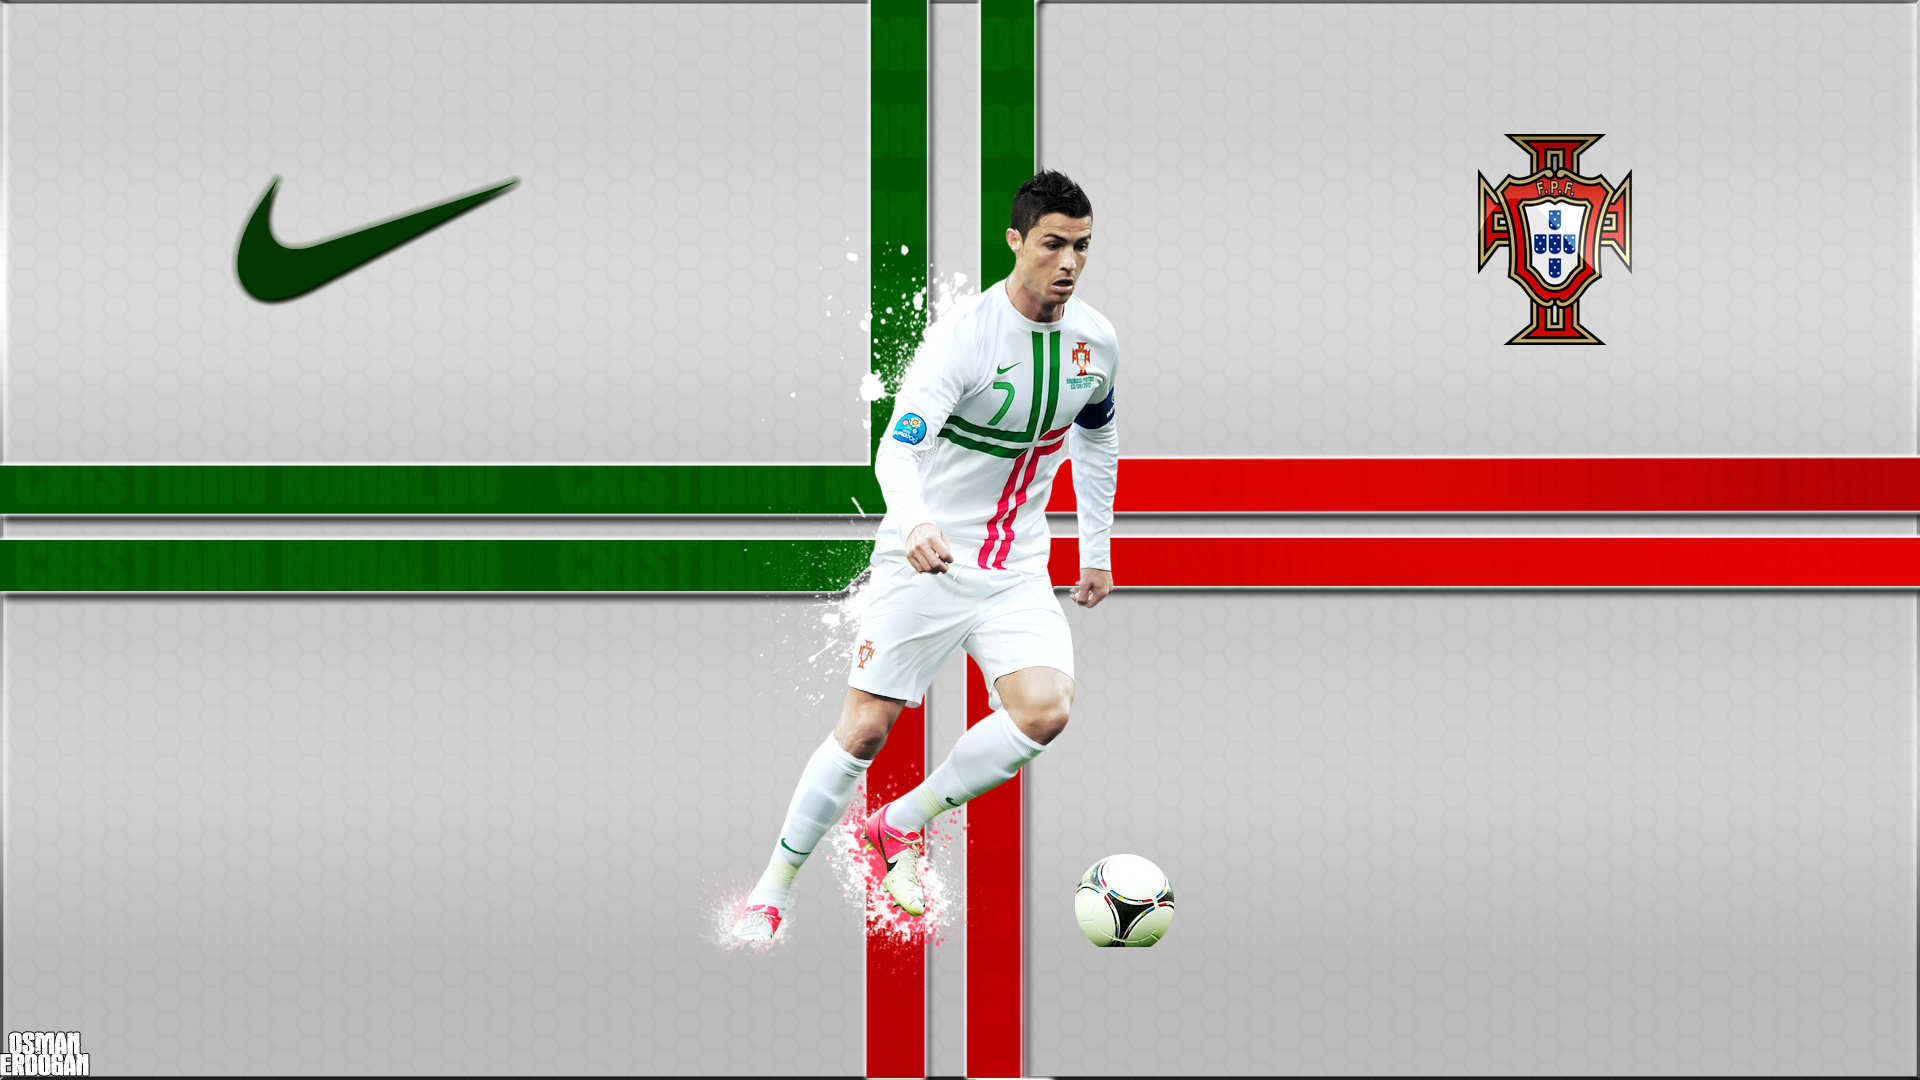 Cristiano Ronaldo CR7 Desktop Wallpaper 391 Wallpaper 1920x1080